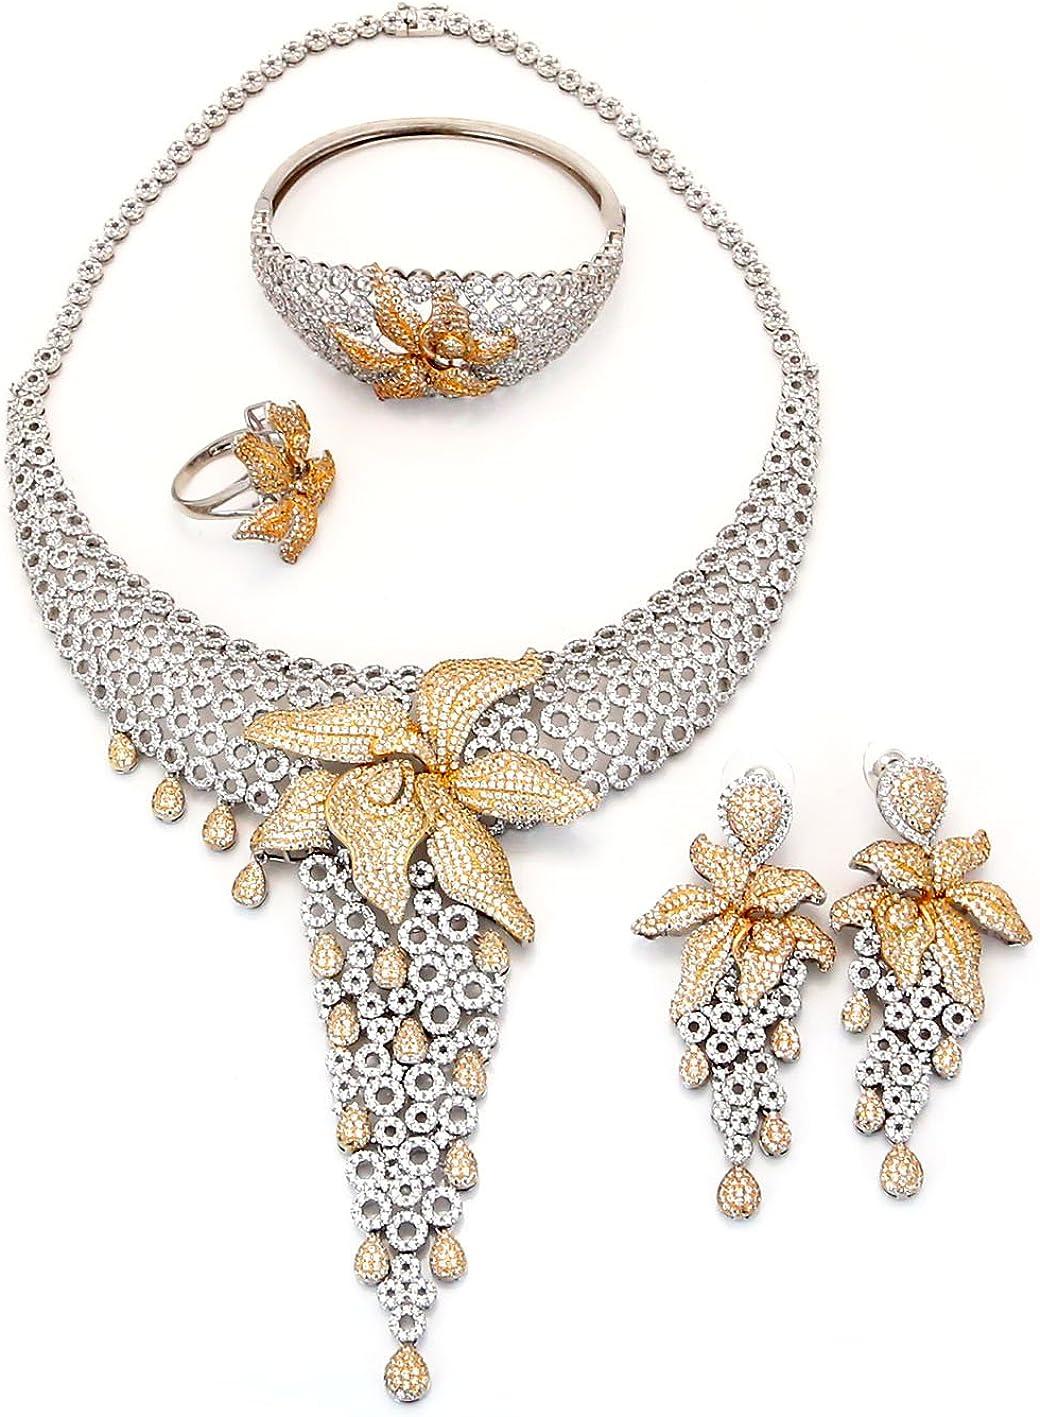 Yulaili Wedding Jewelry Set,17